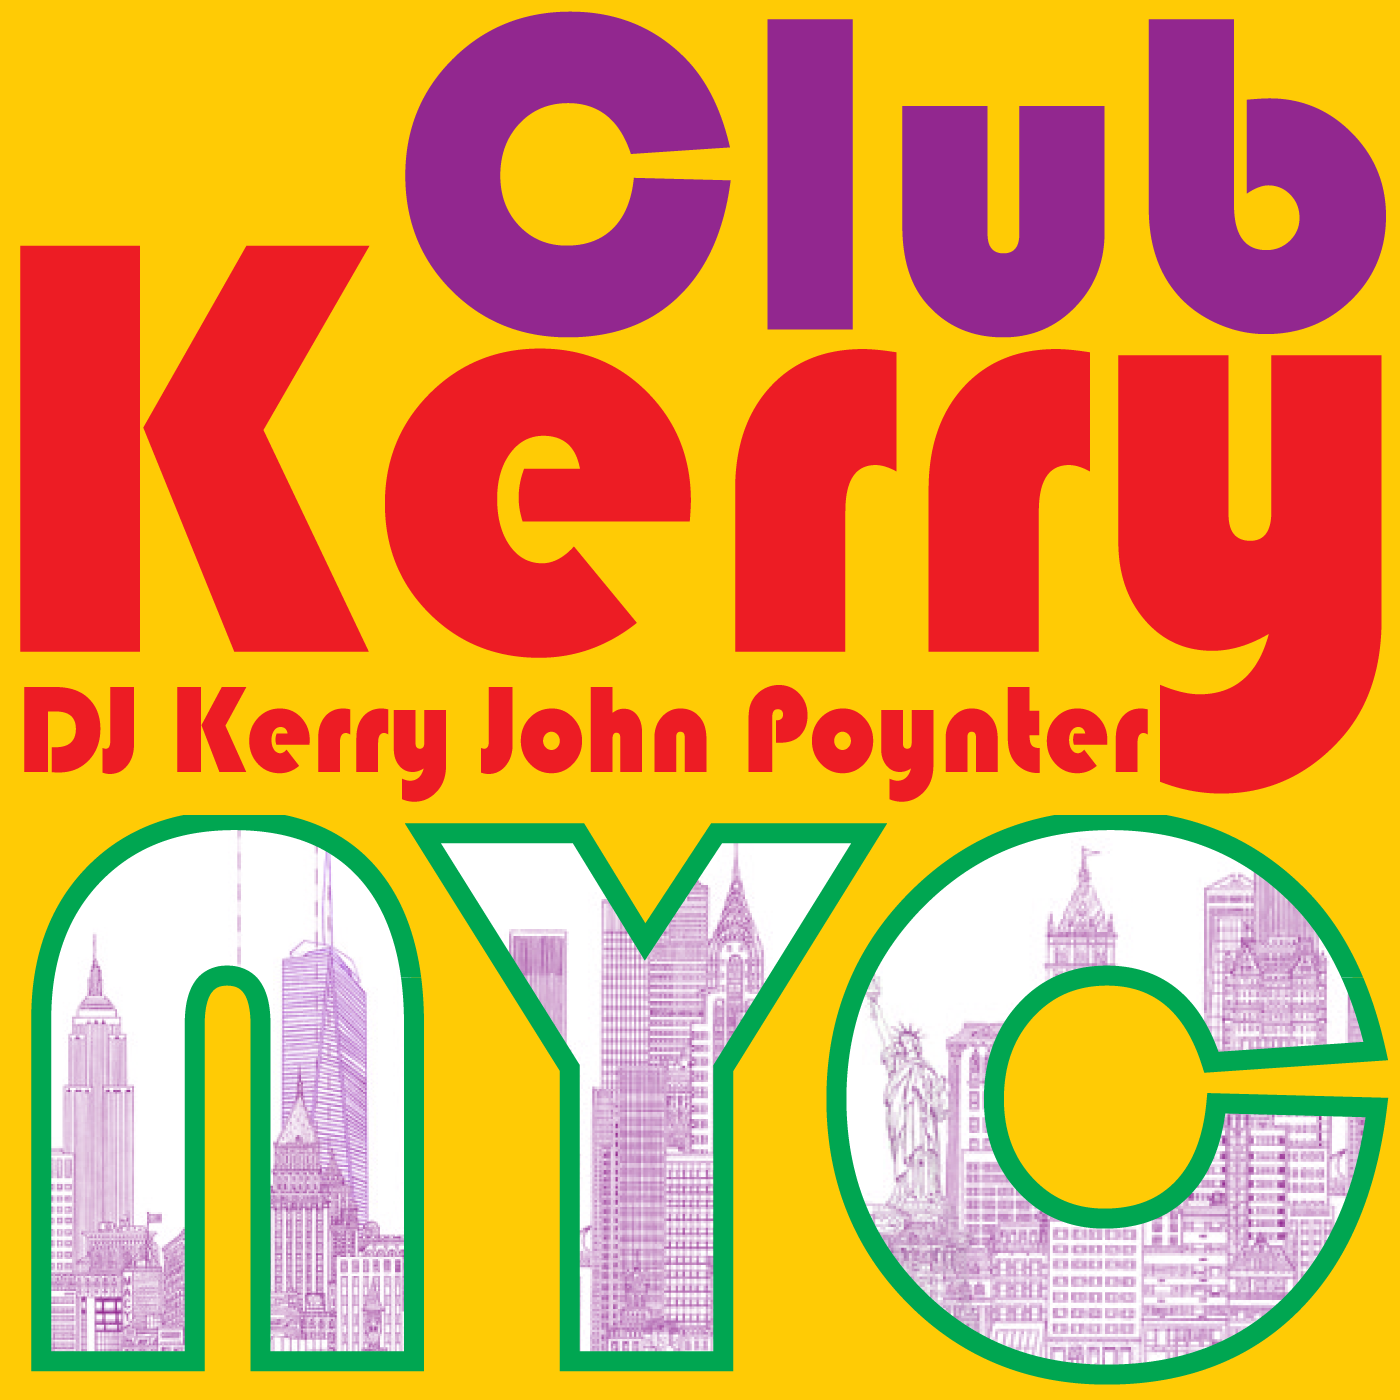 Let's Hear It 4 The Boyz 10 (Vocal House, Melodic House, Deep House) - DJ Kerry John Poynter show art